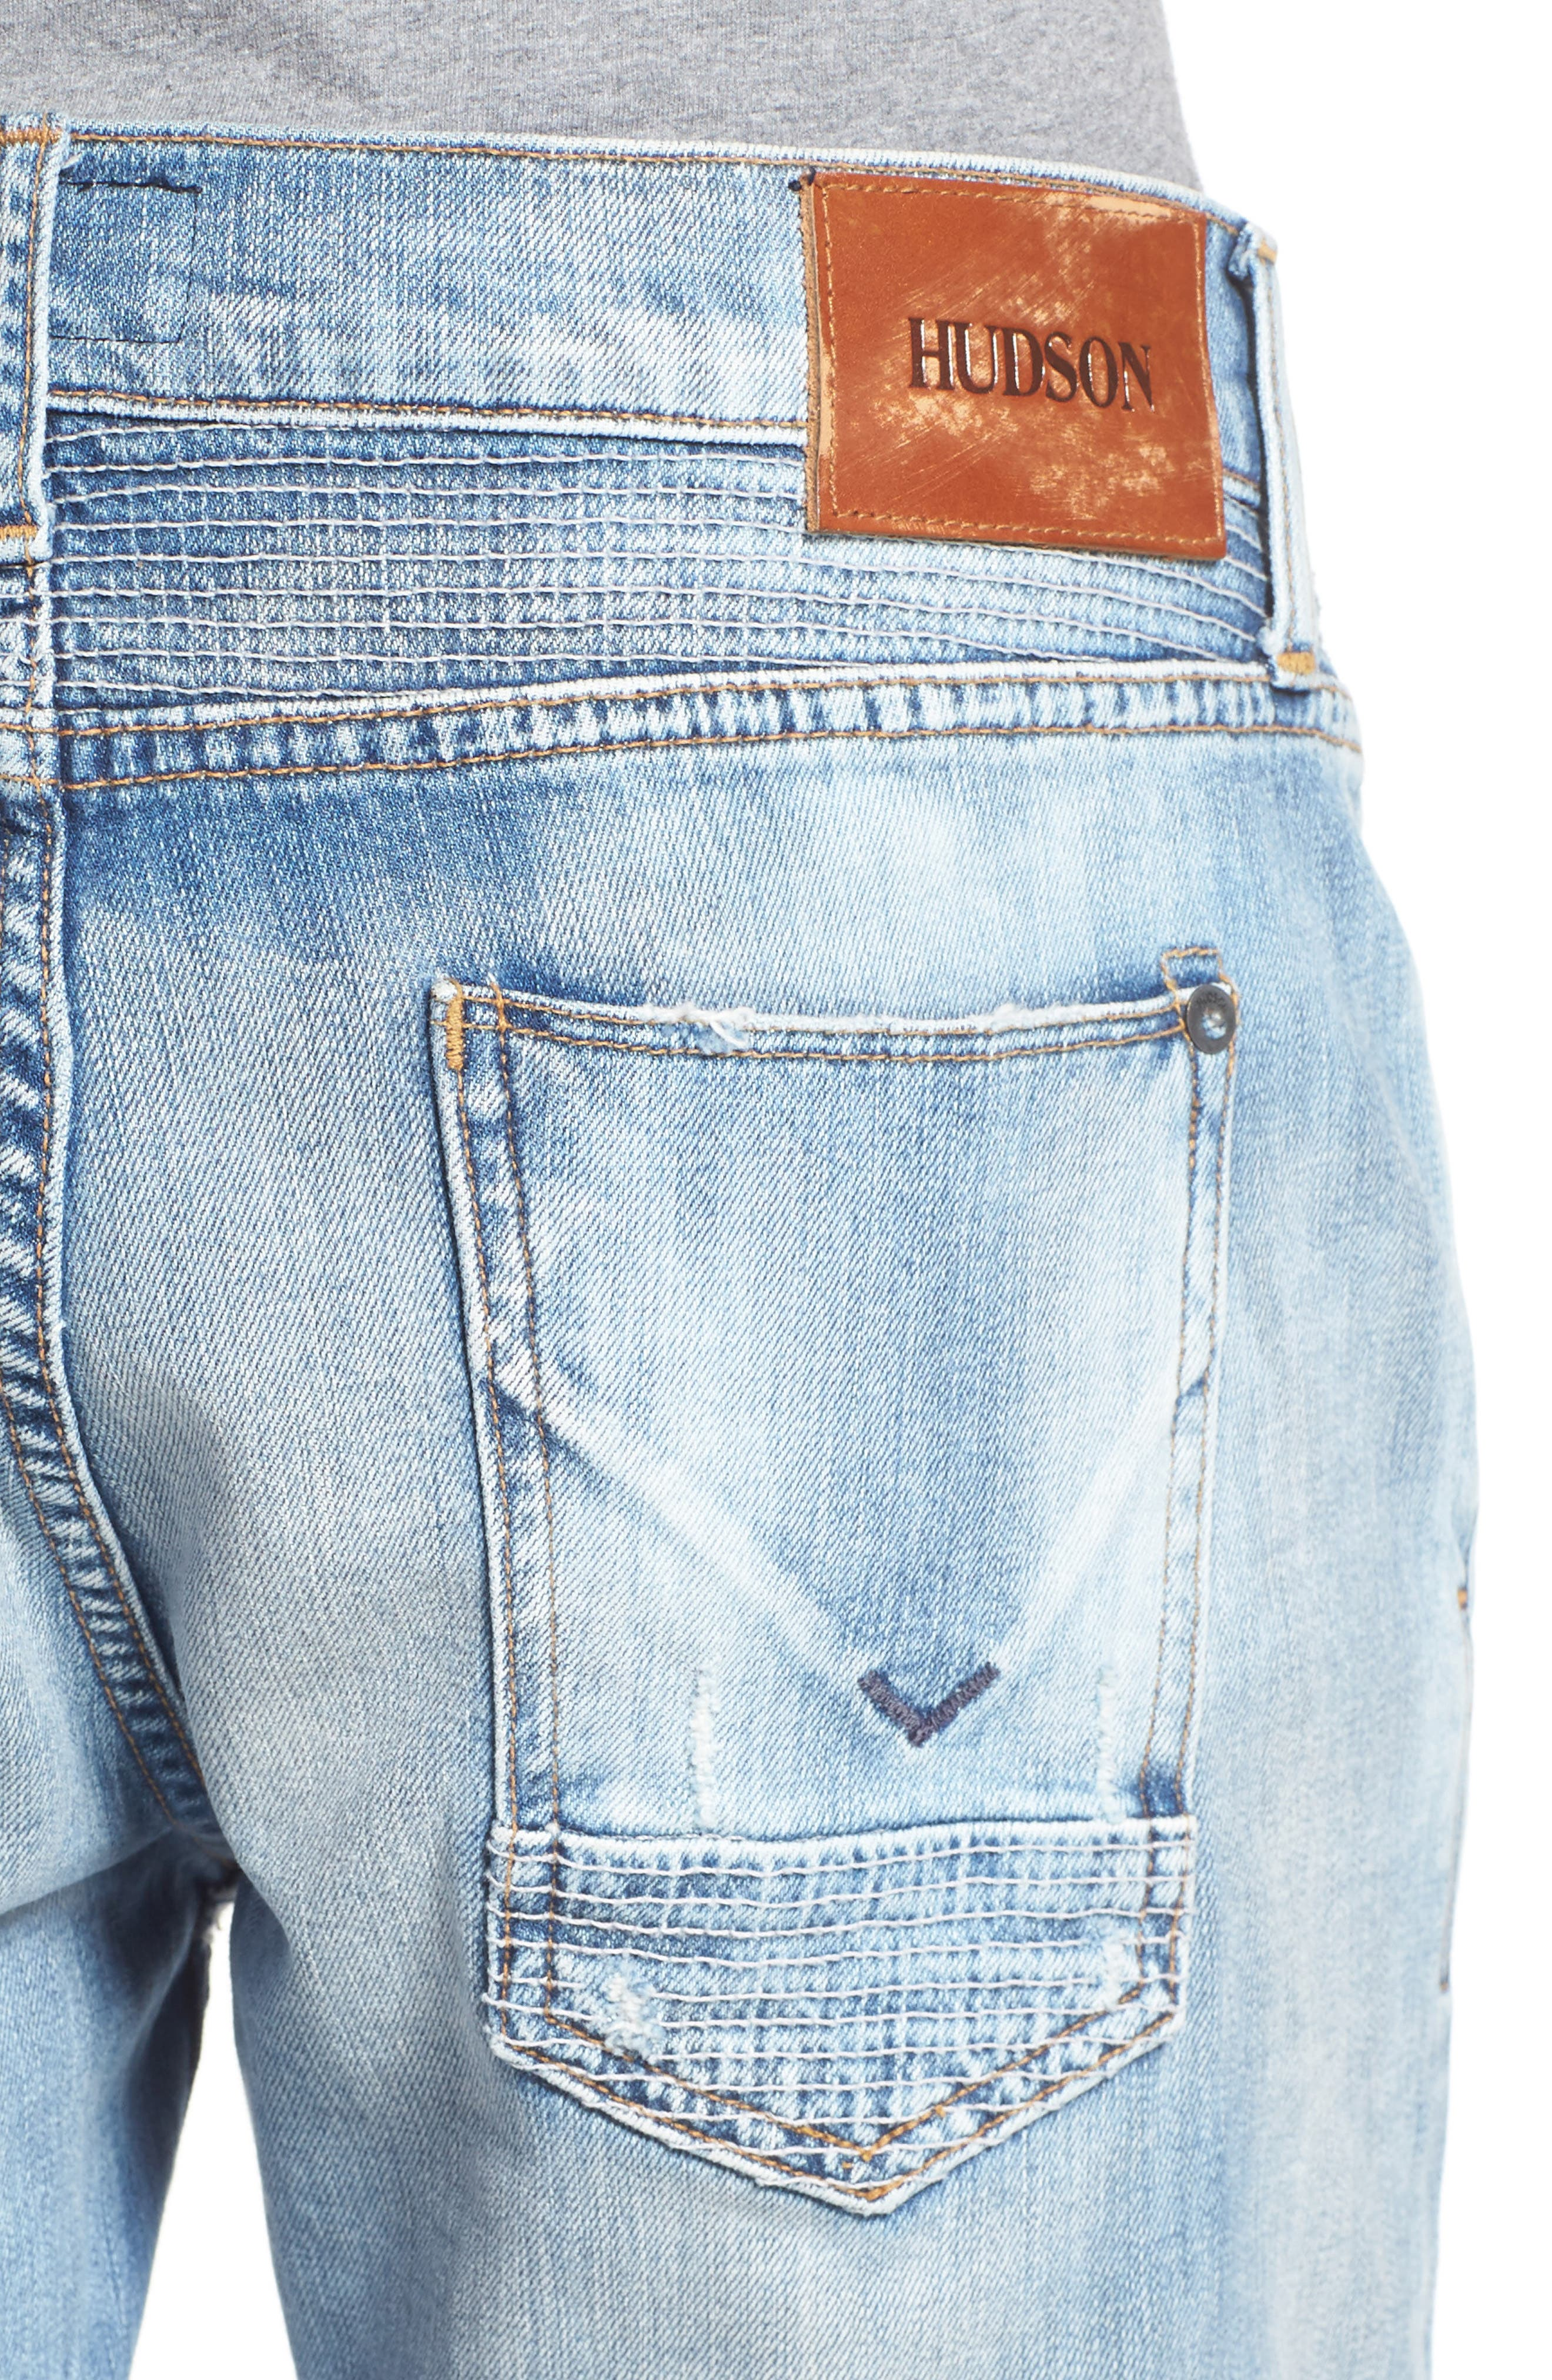 Blinder Skinny Fit Moto Jeans,                             Alternate thumbnail 4, color,                             THRASH